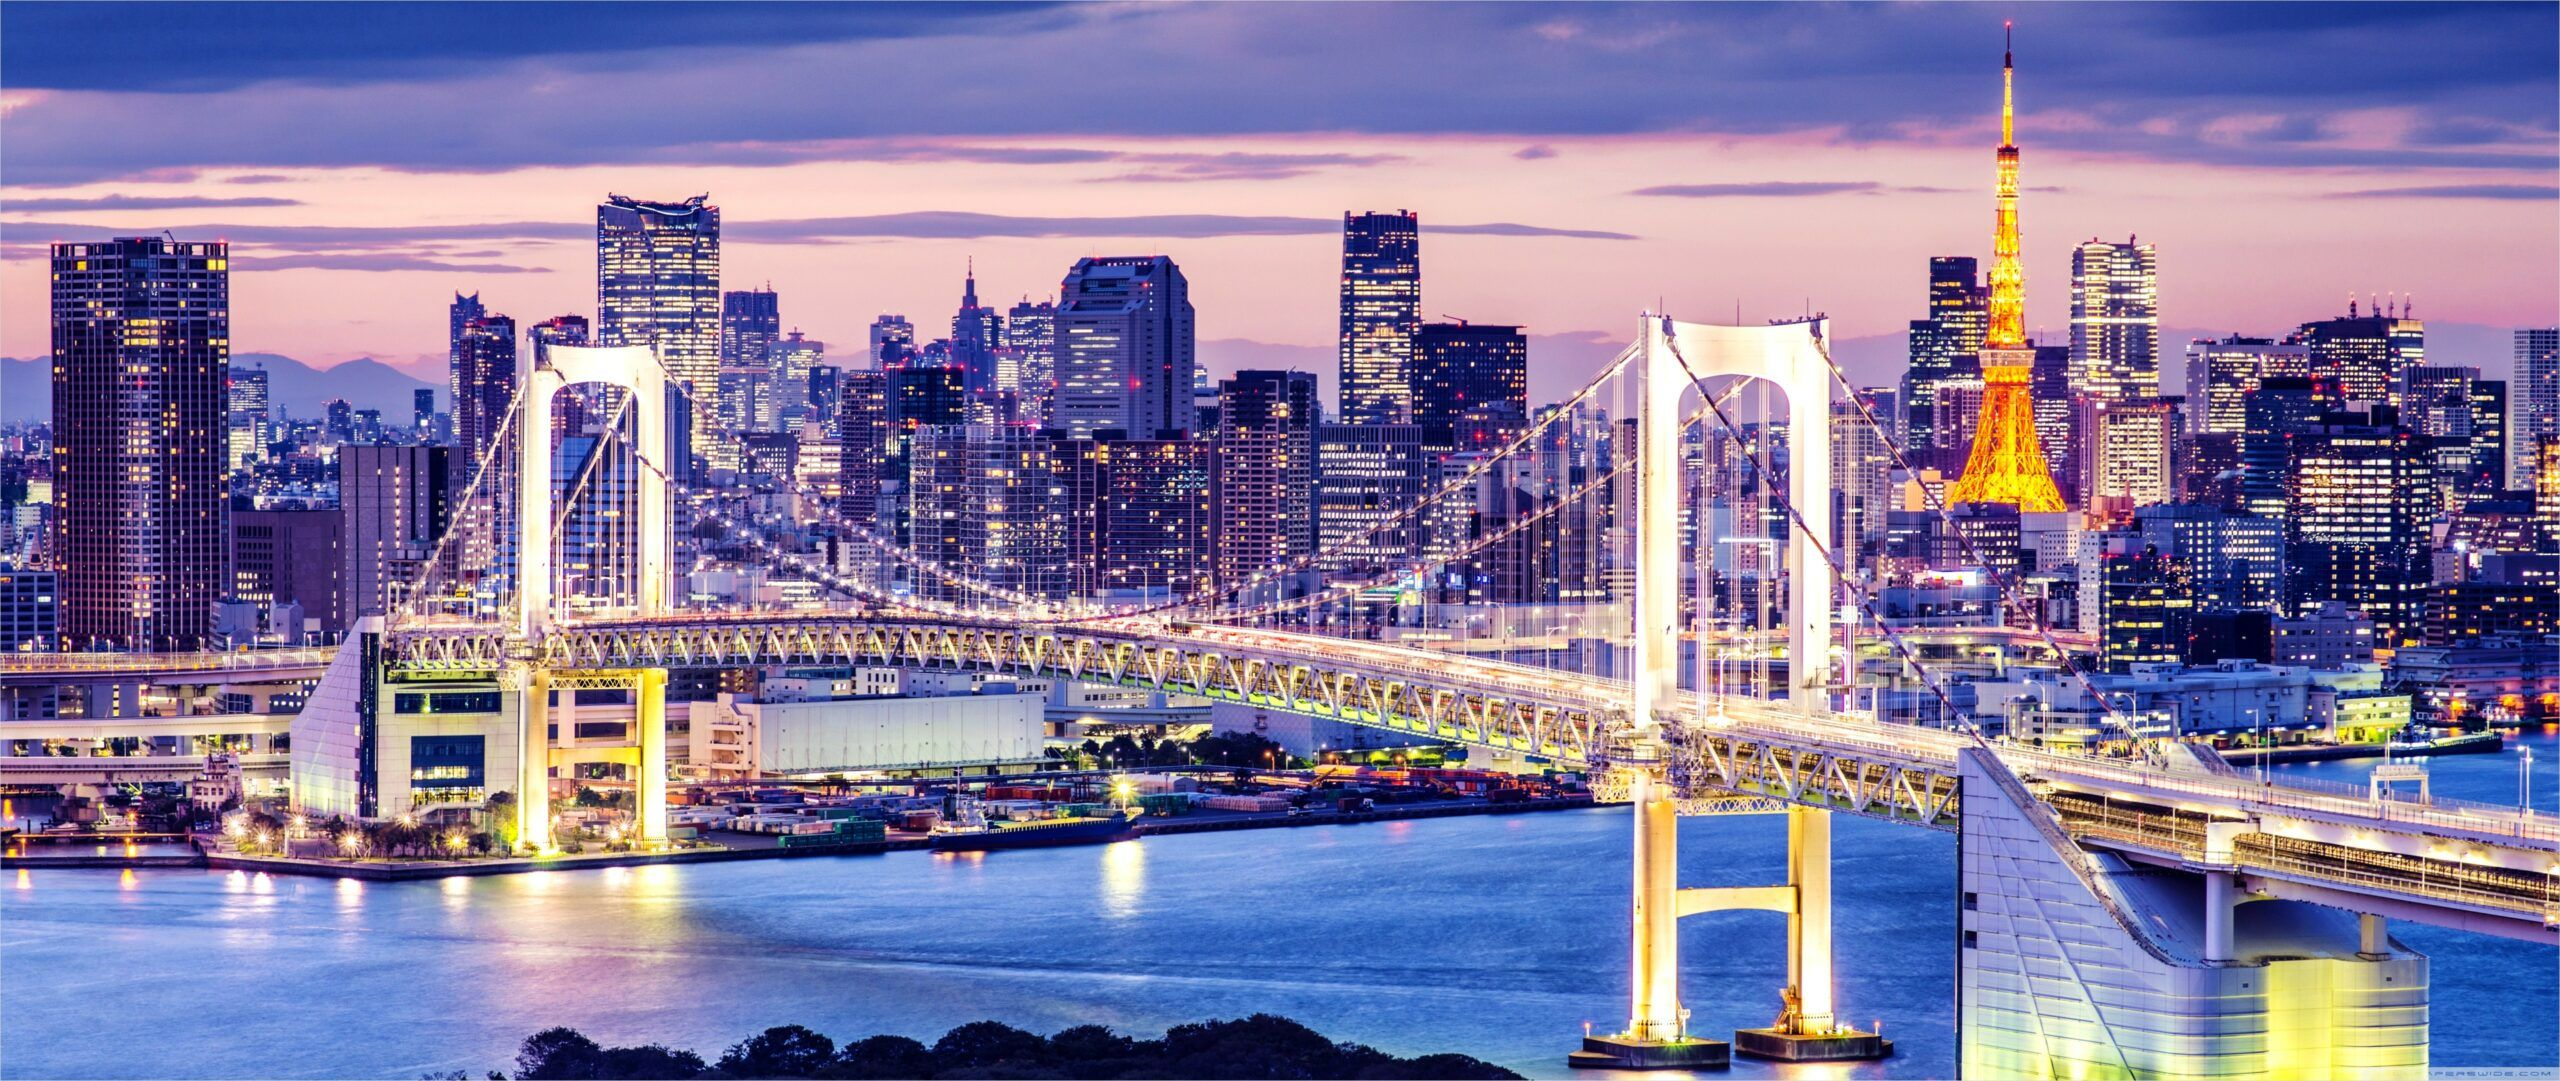 4k 21 9 Wallpaper Japan In 2020 Summer Travel Scenic Rainbow Bridge